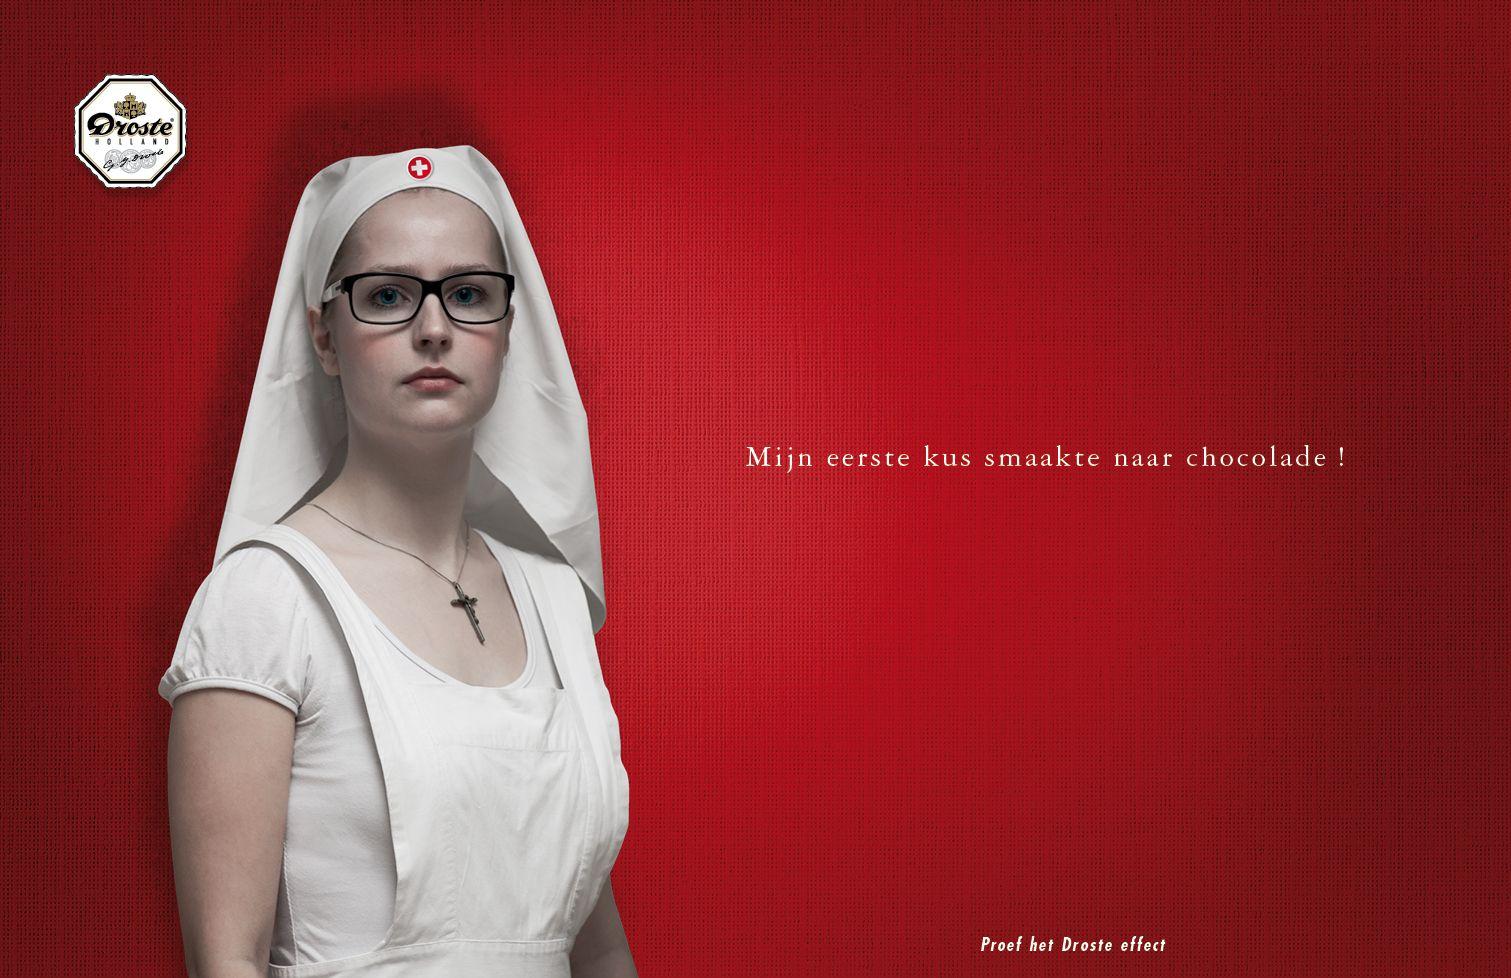 Droste campaign: Mijn eerste kus by Huub van Osch #vOSCH #huubvanosch #blahblahism #amsterdam #Droste